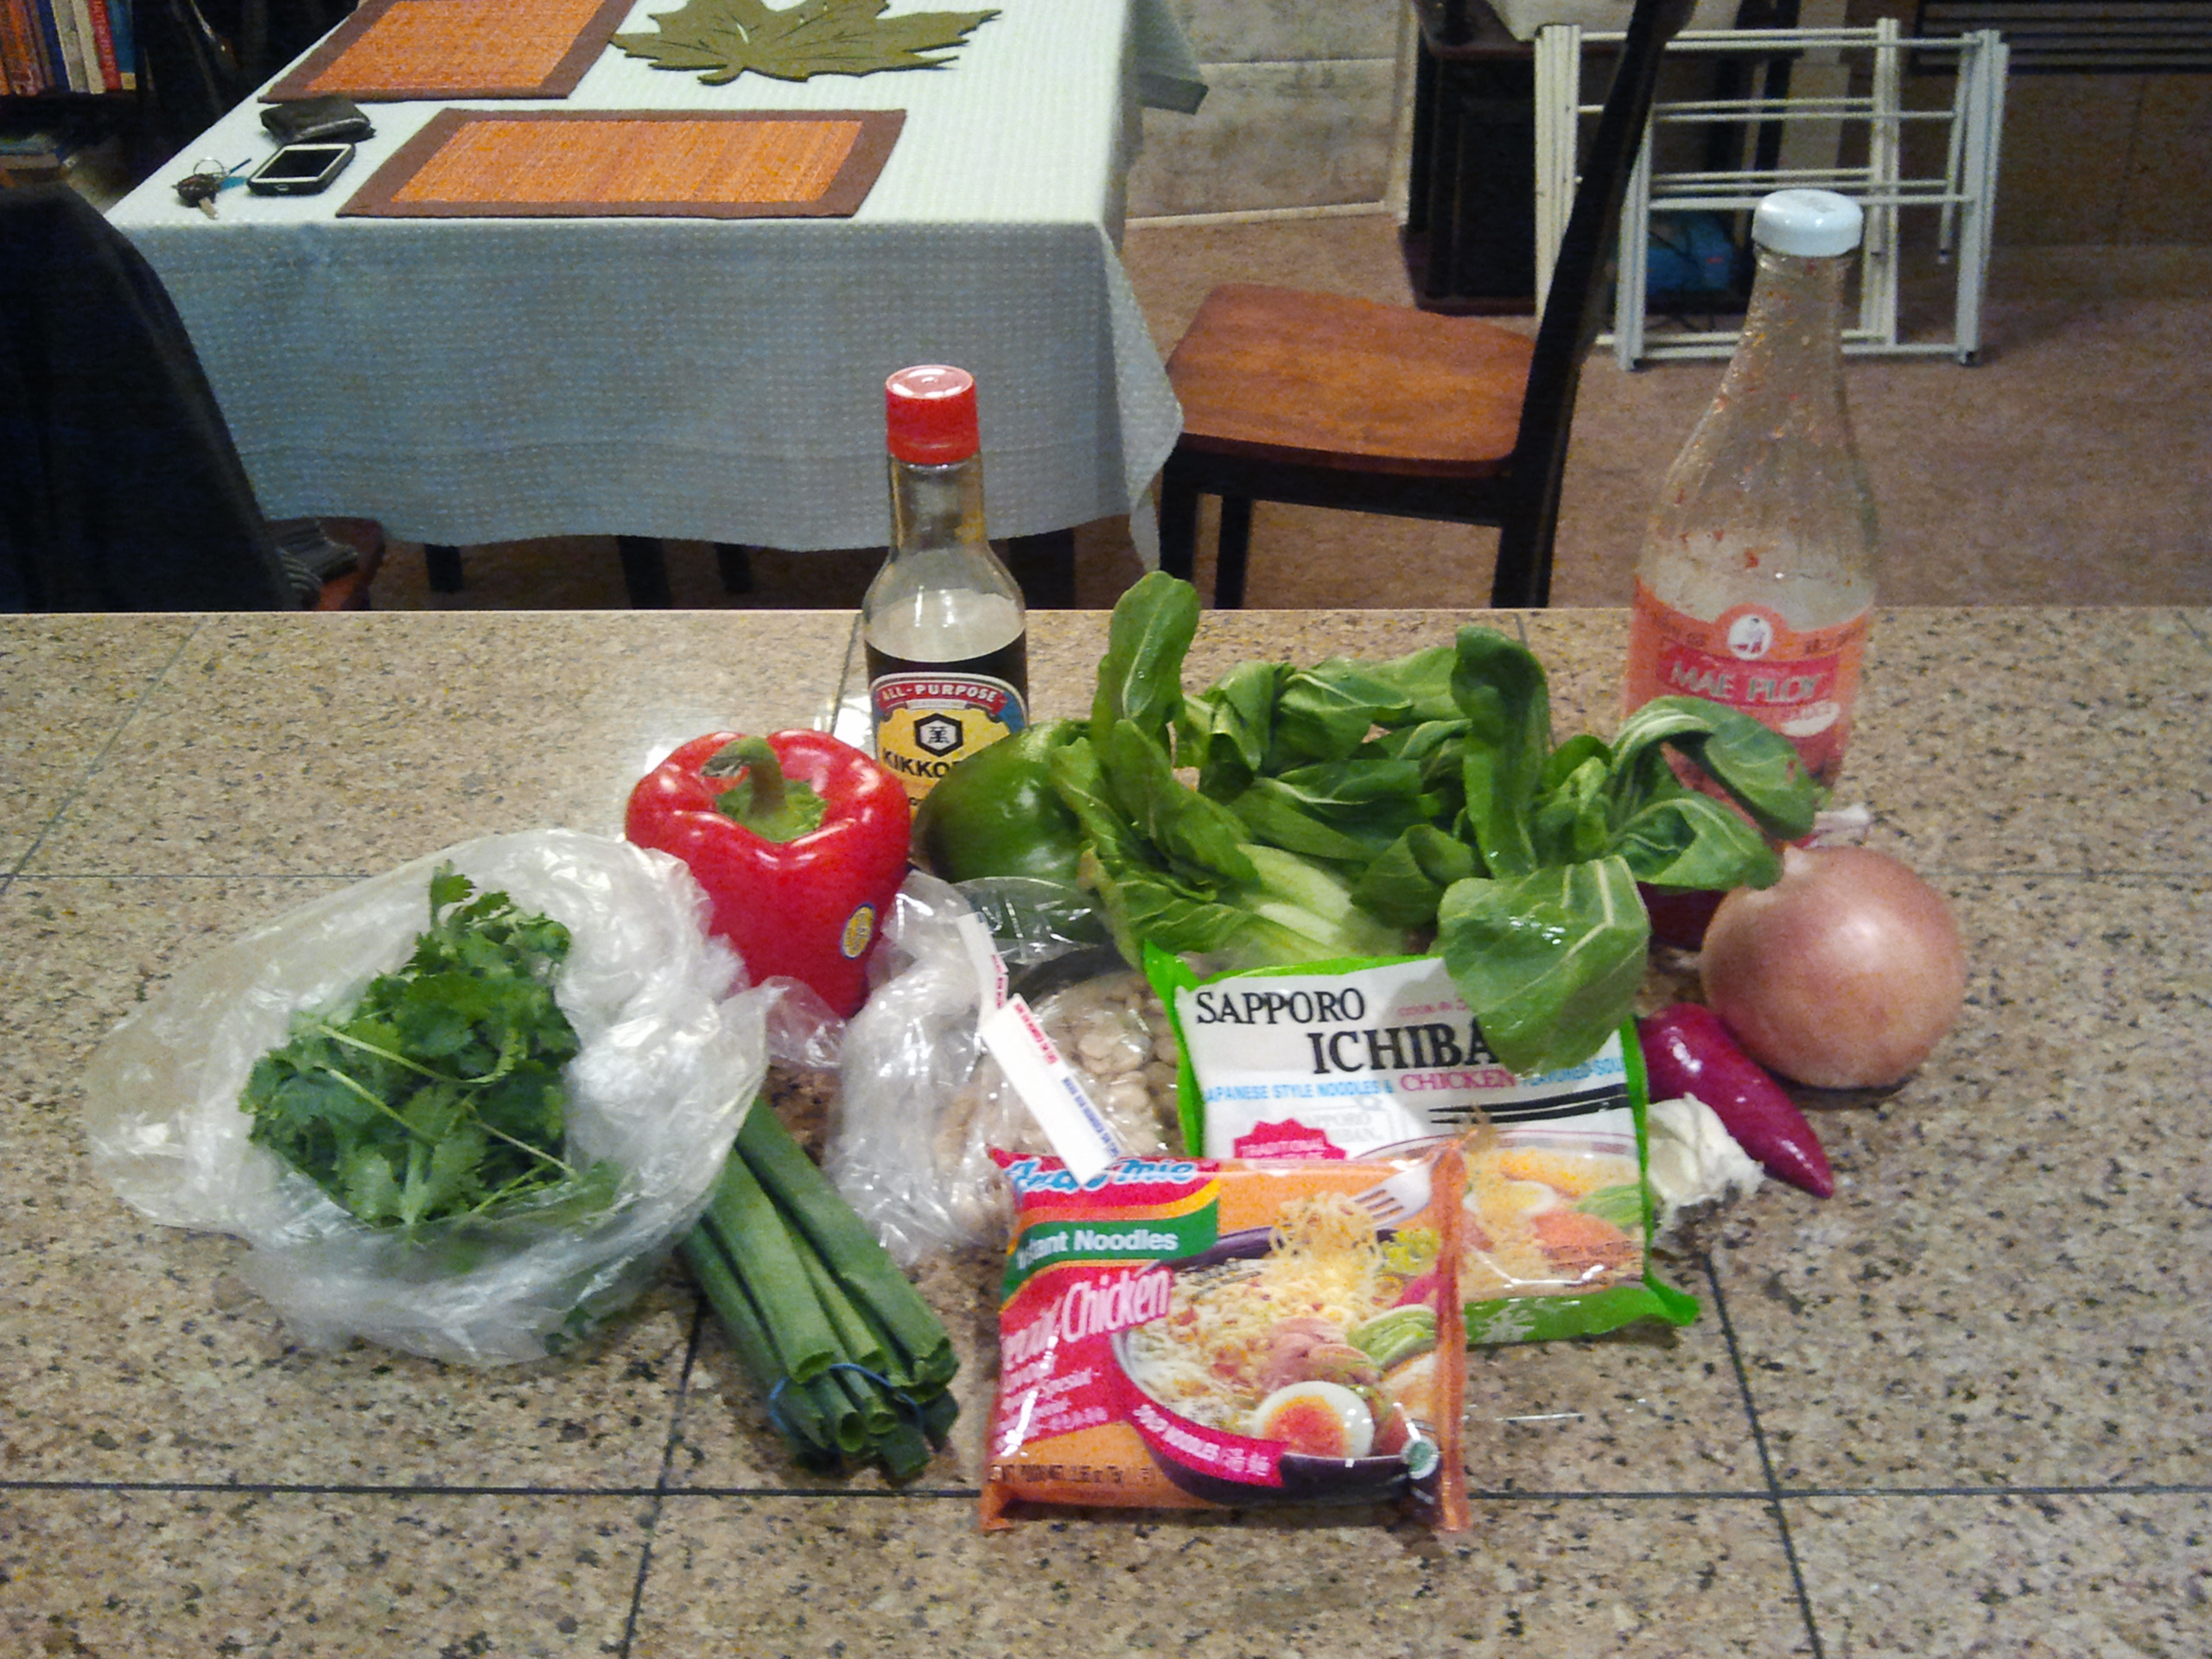 Instant noodle ingredients